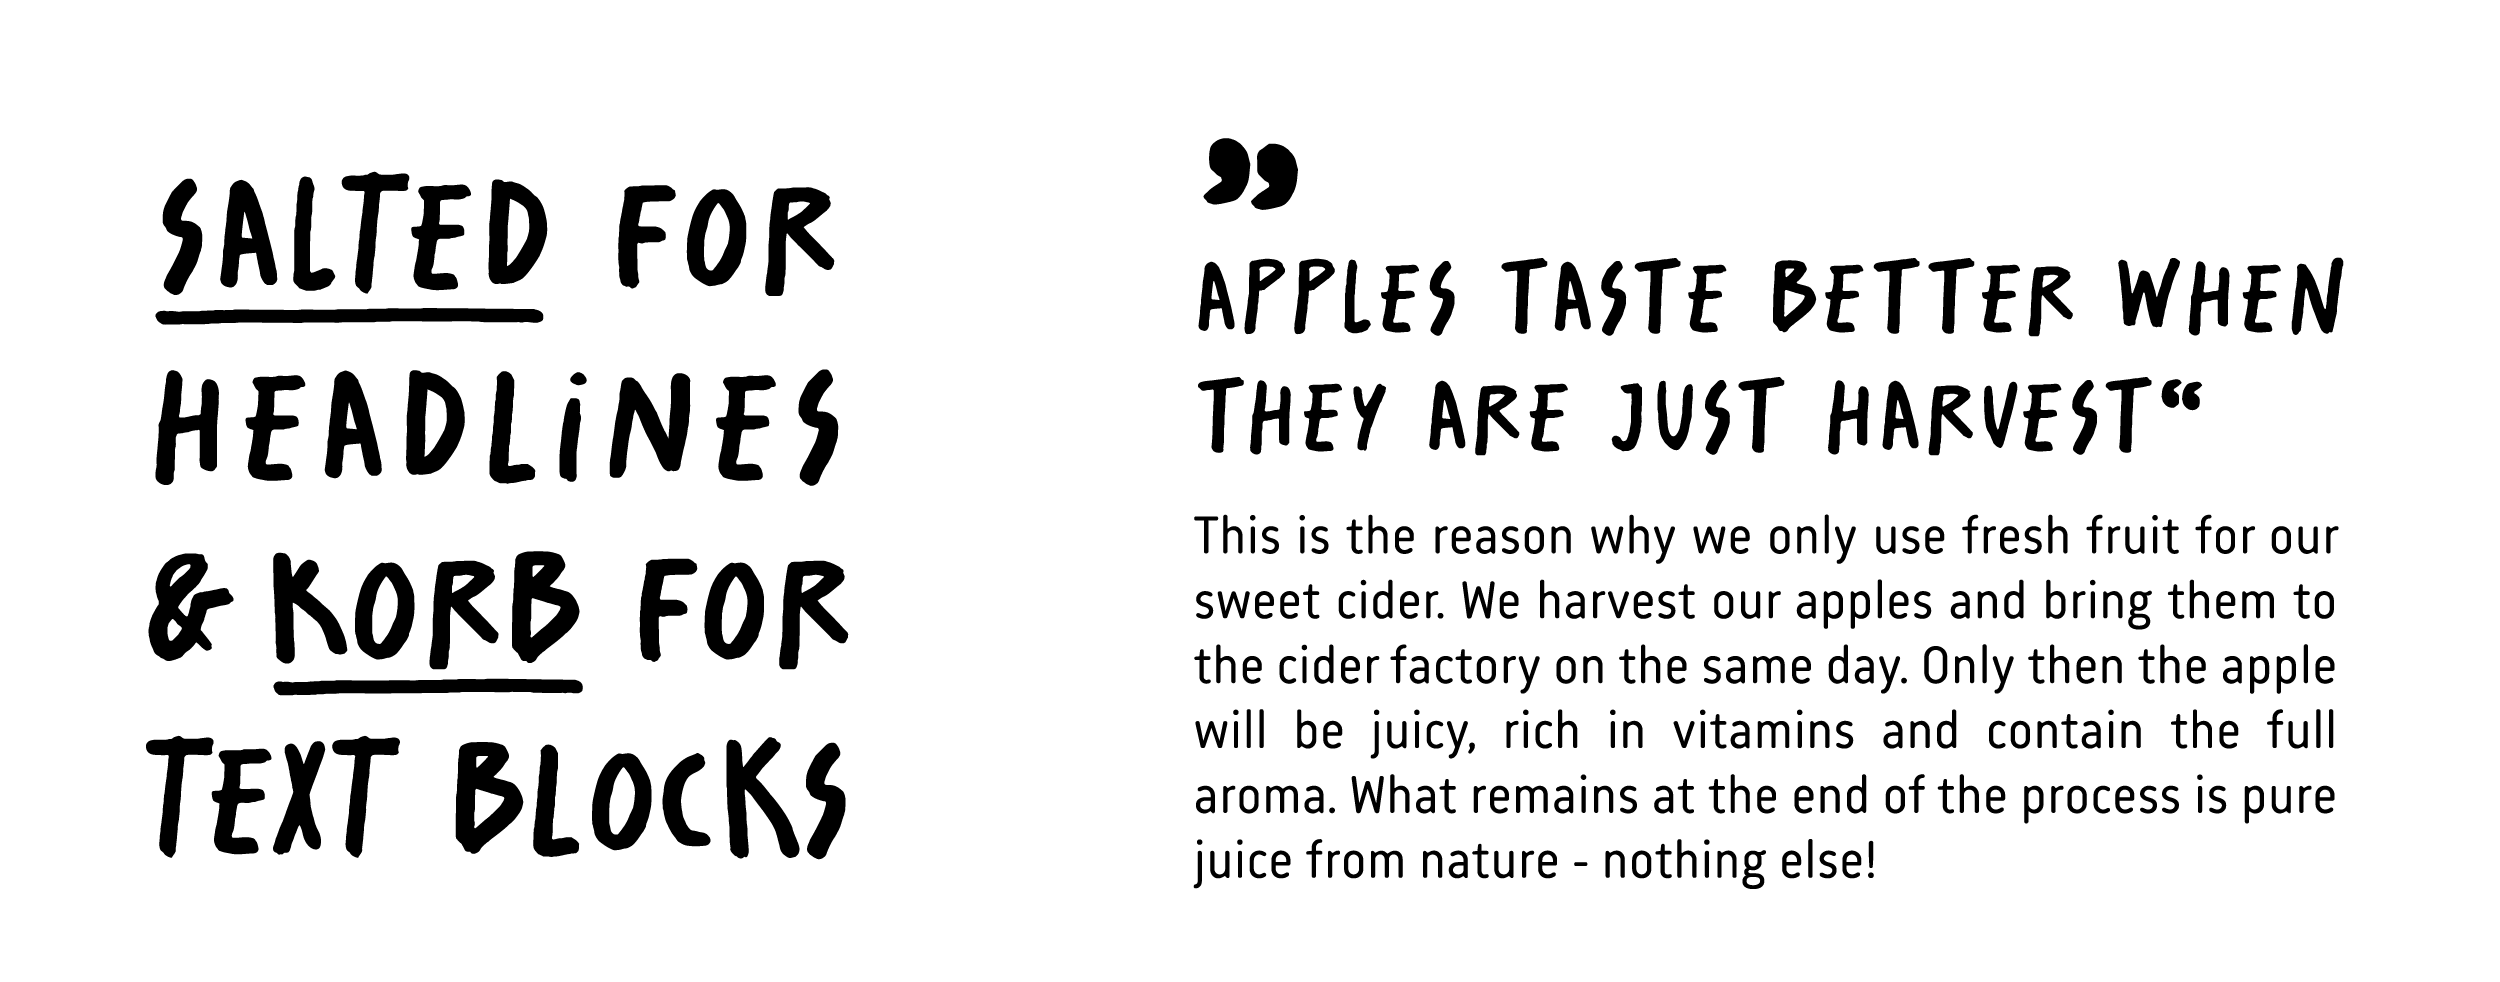 DURSTIGER-HASE-GPU-Design-typography